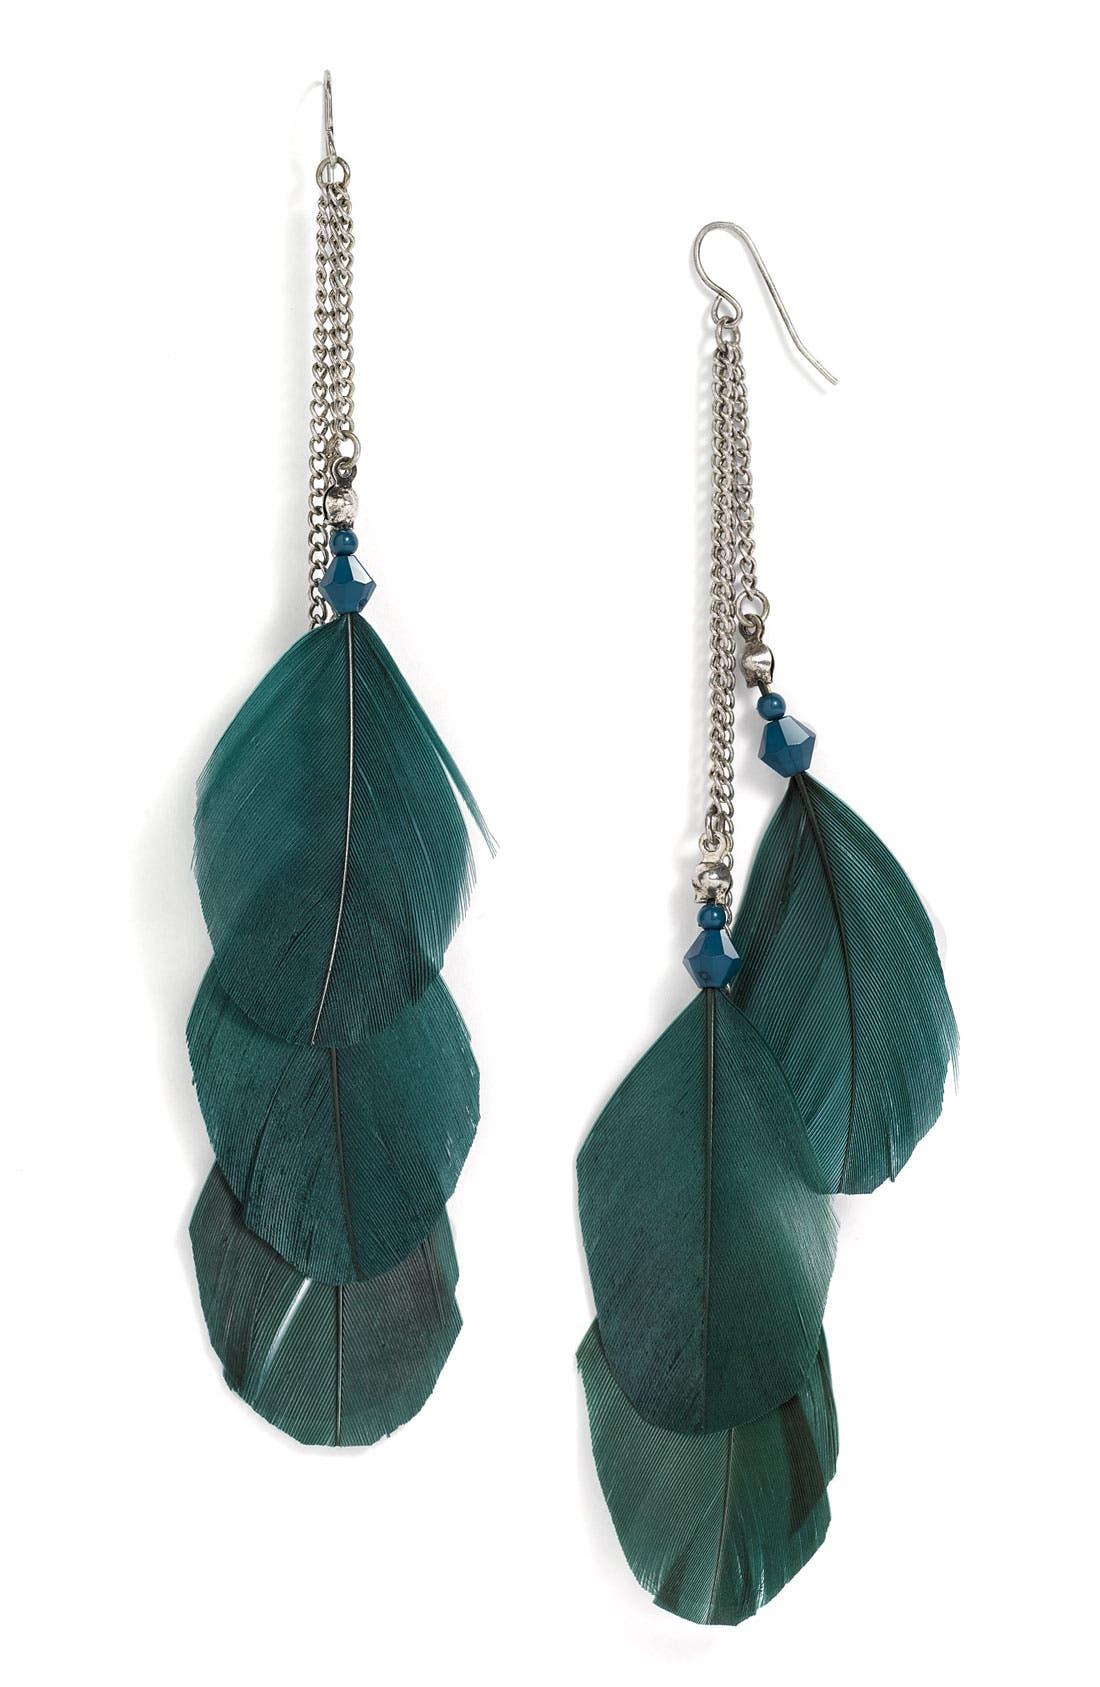 Main Image - Stephan & Co. Feather & Bead Earrings